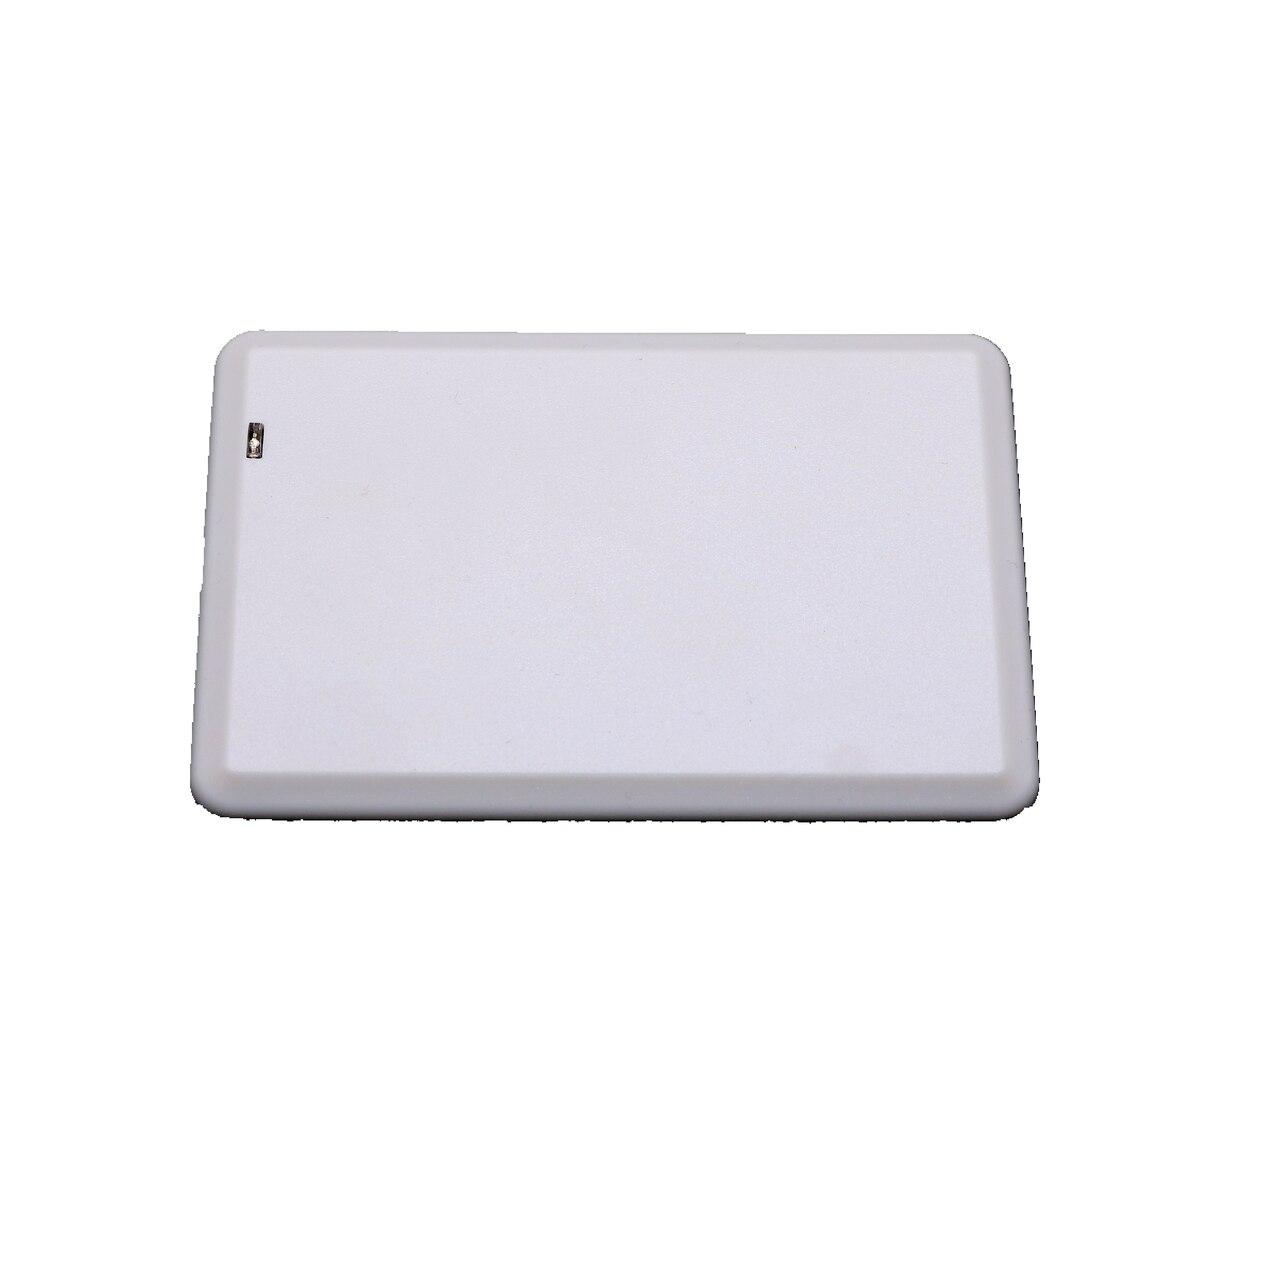 UHF USB Okuyucu ISO18000-6C (EPC G2) 6B Okuma 920 Mhz 925 MhzUHF USB Okuyucu ISO18000-6C (EPC G2) 6B Okuma 920 Mhz 925 Mhz